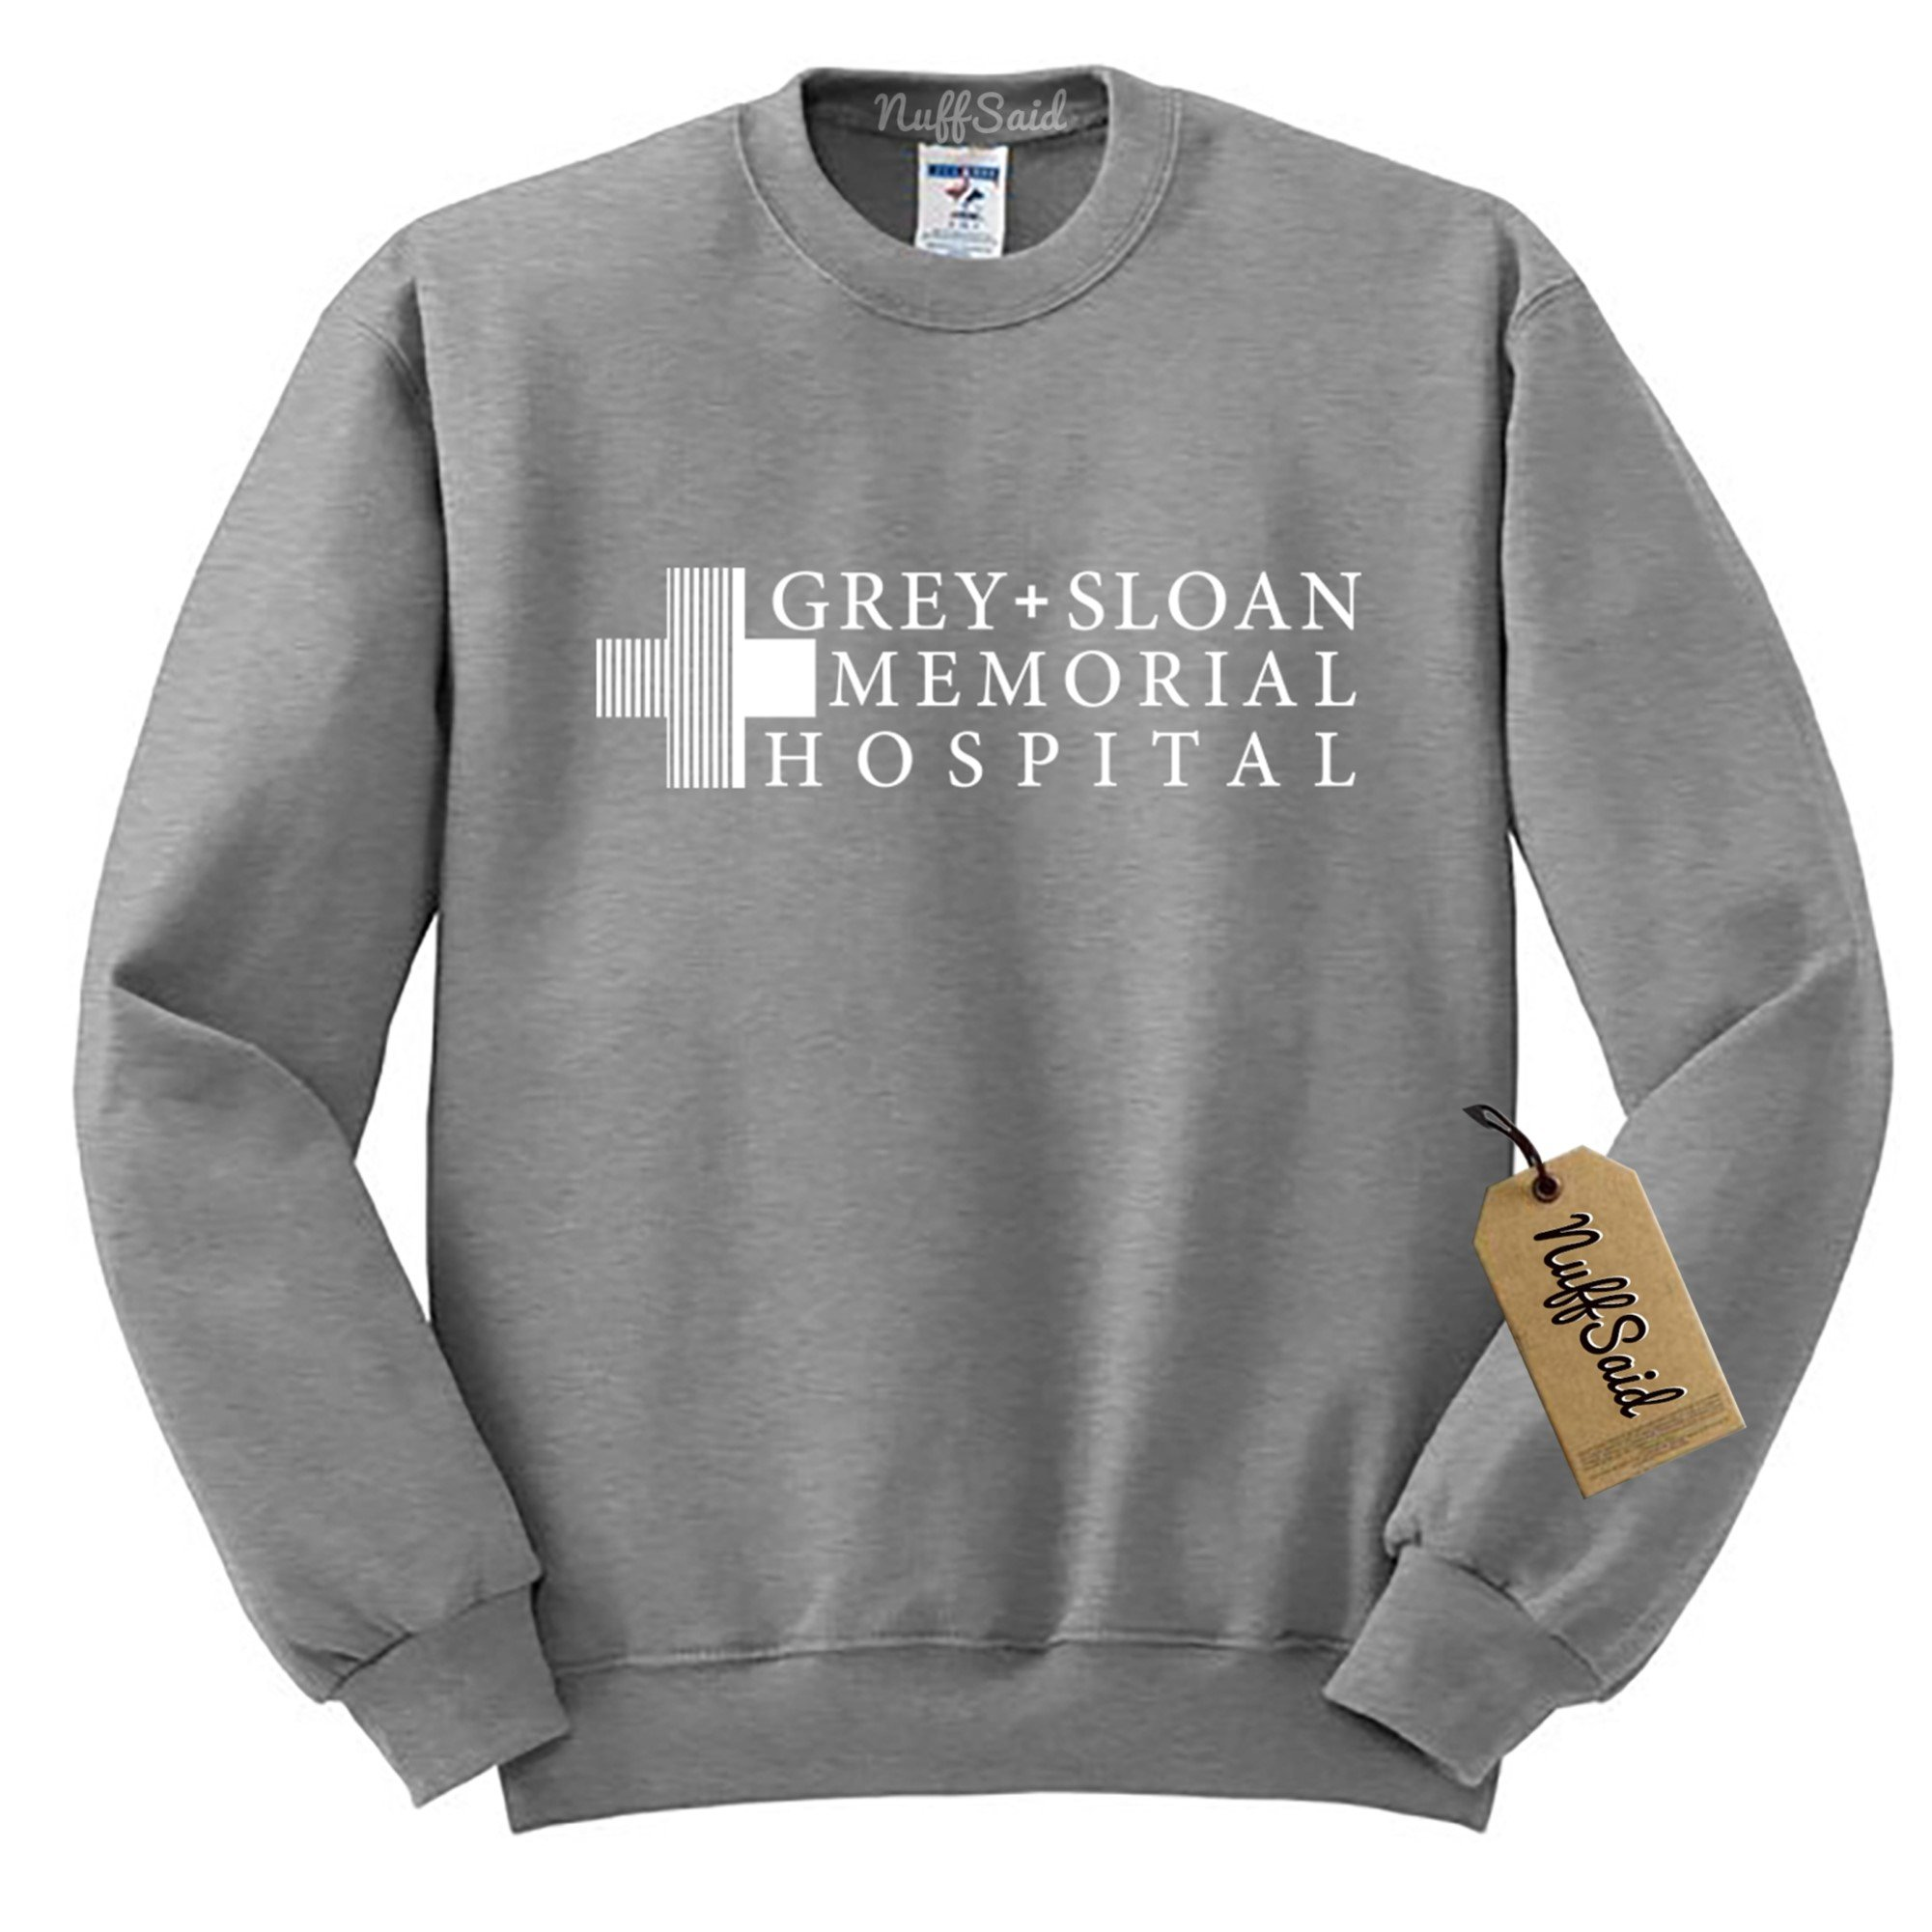 Grey Sloan Memorial Hospital Sweatshirt Sweater Crew Neck Pullover - Premium Quality (Small, Grey)